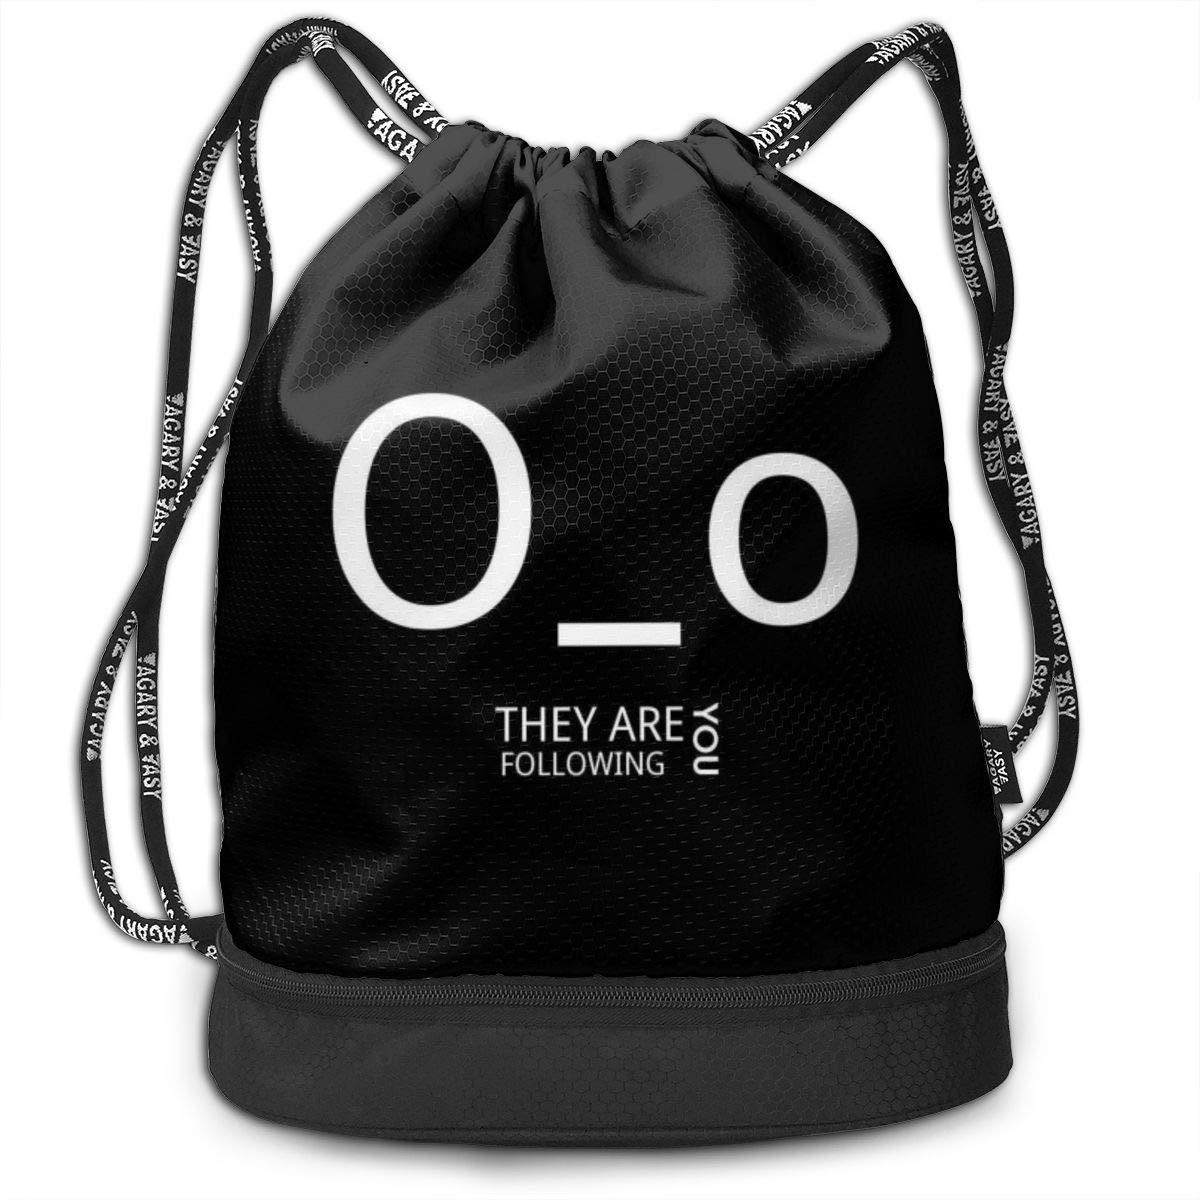 They Are Following You Drawstring Bag Multipurpose Bundle Dance Bag Sack Pack